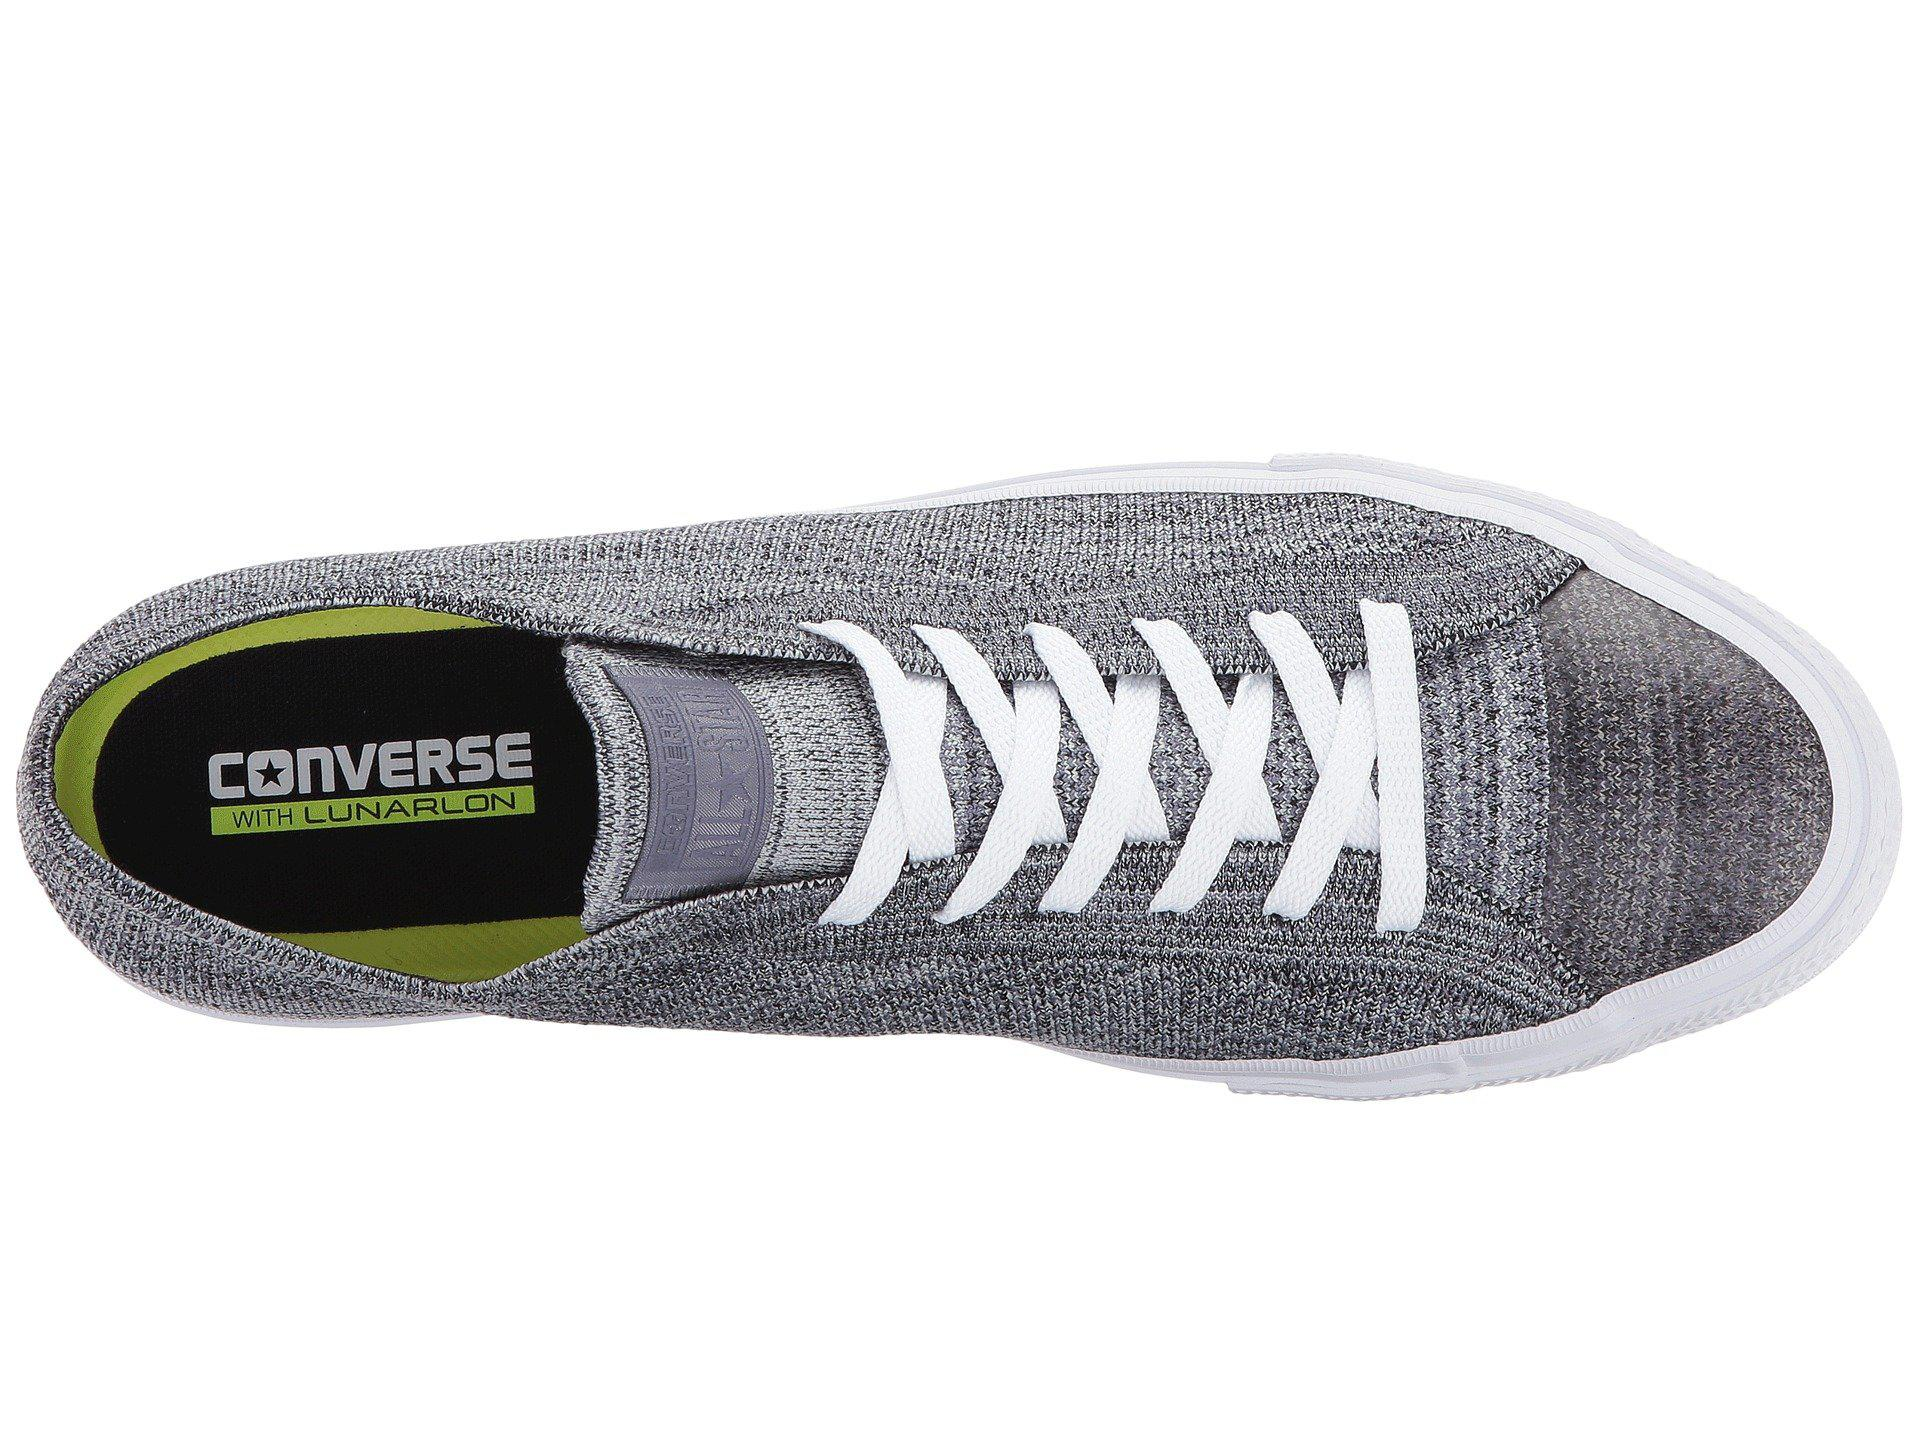 Lyst - Converse Chuck Taylor® All Star® X Nike Flyknit Ox for Men ab6b29a1b